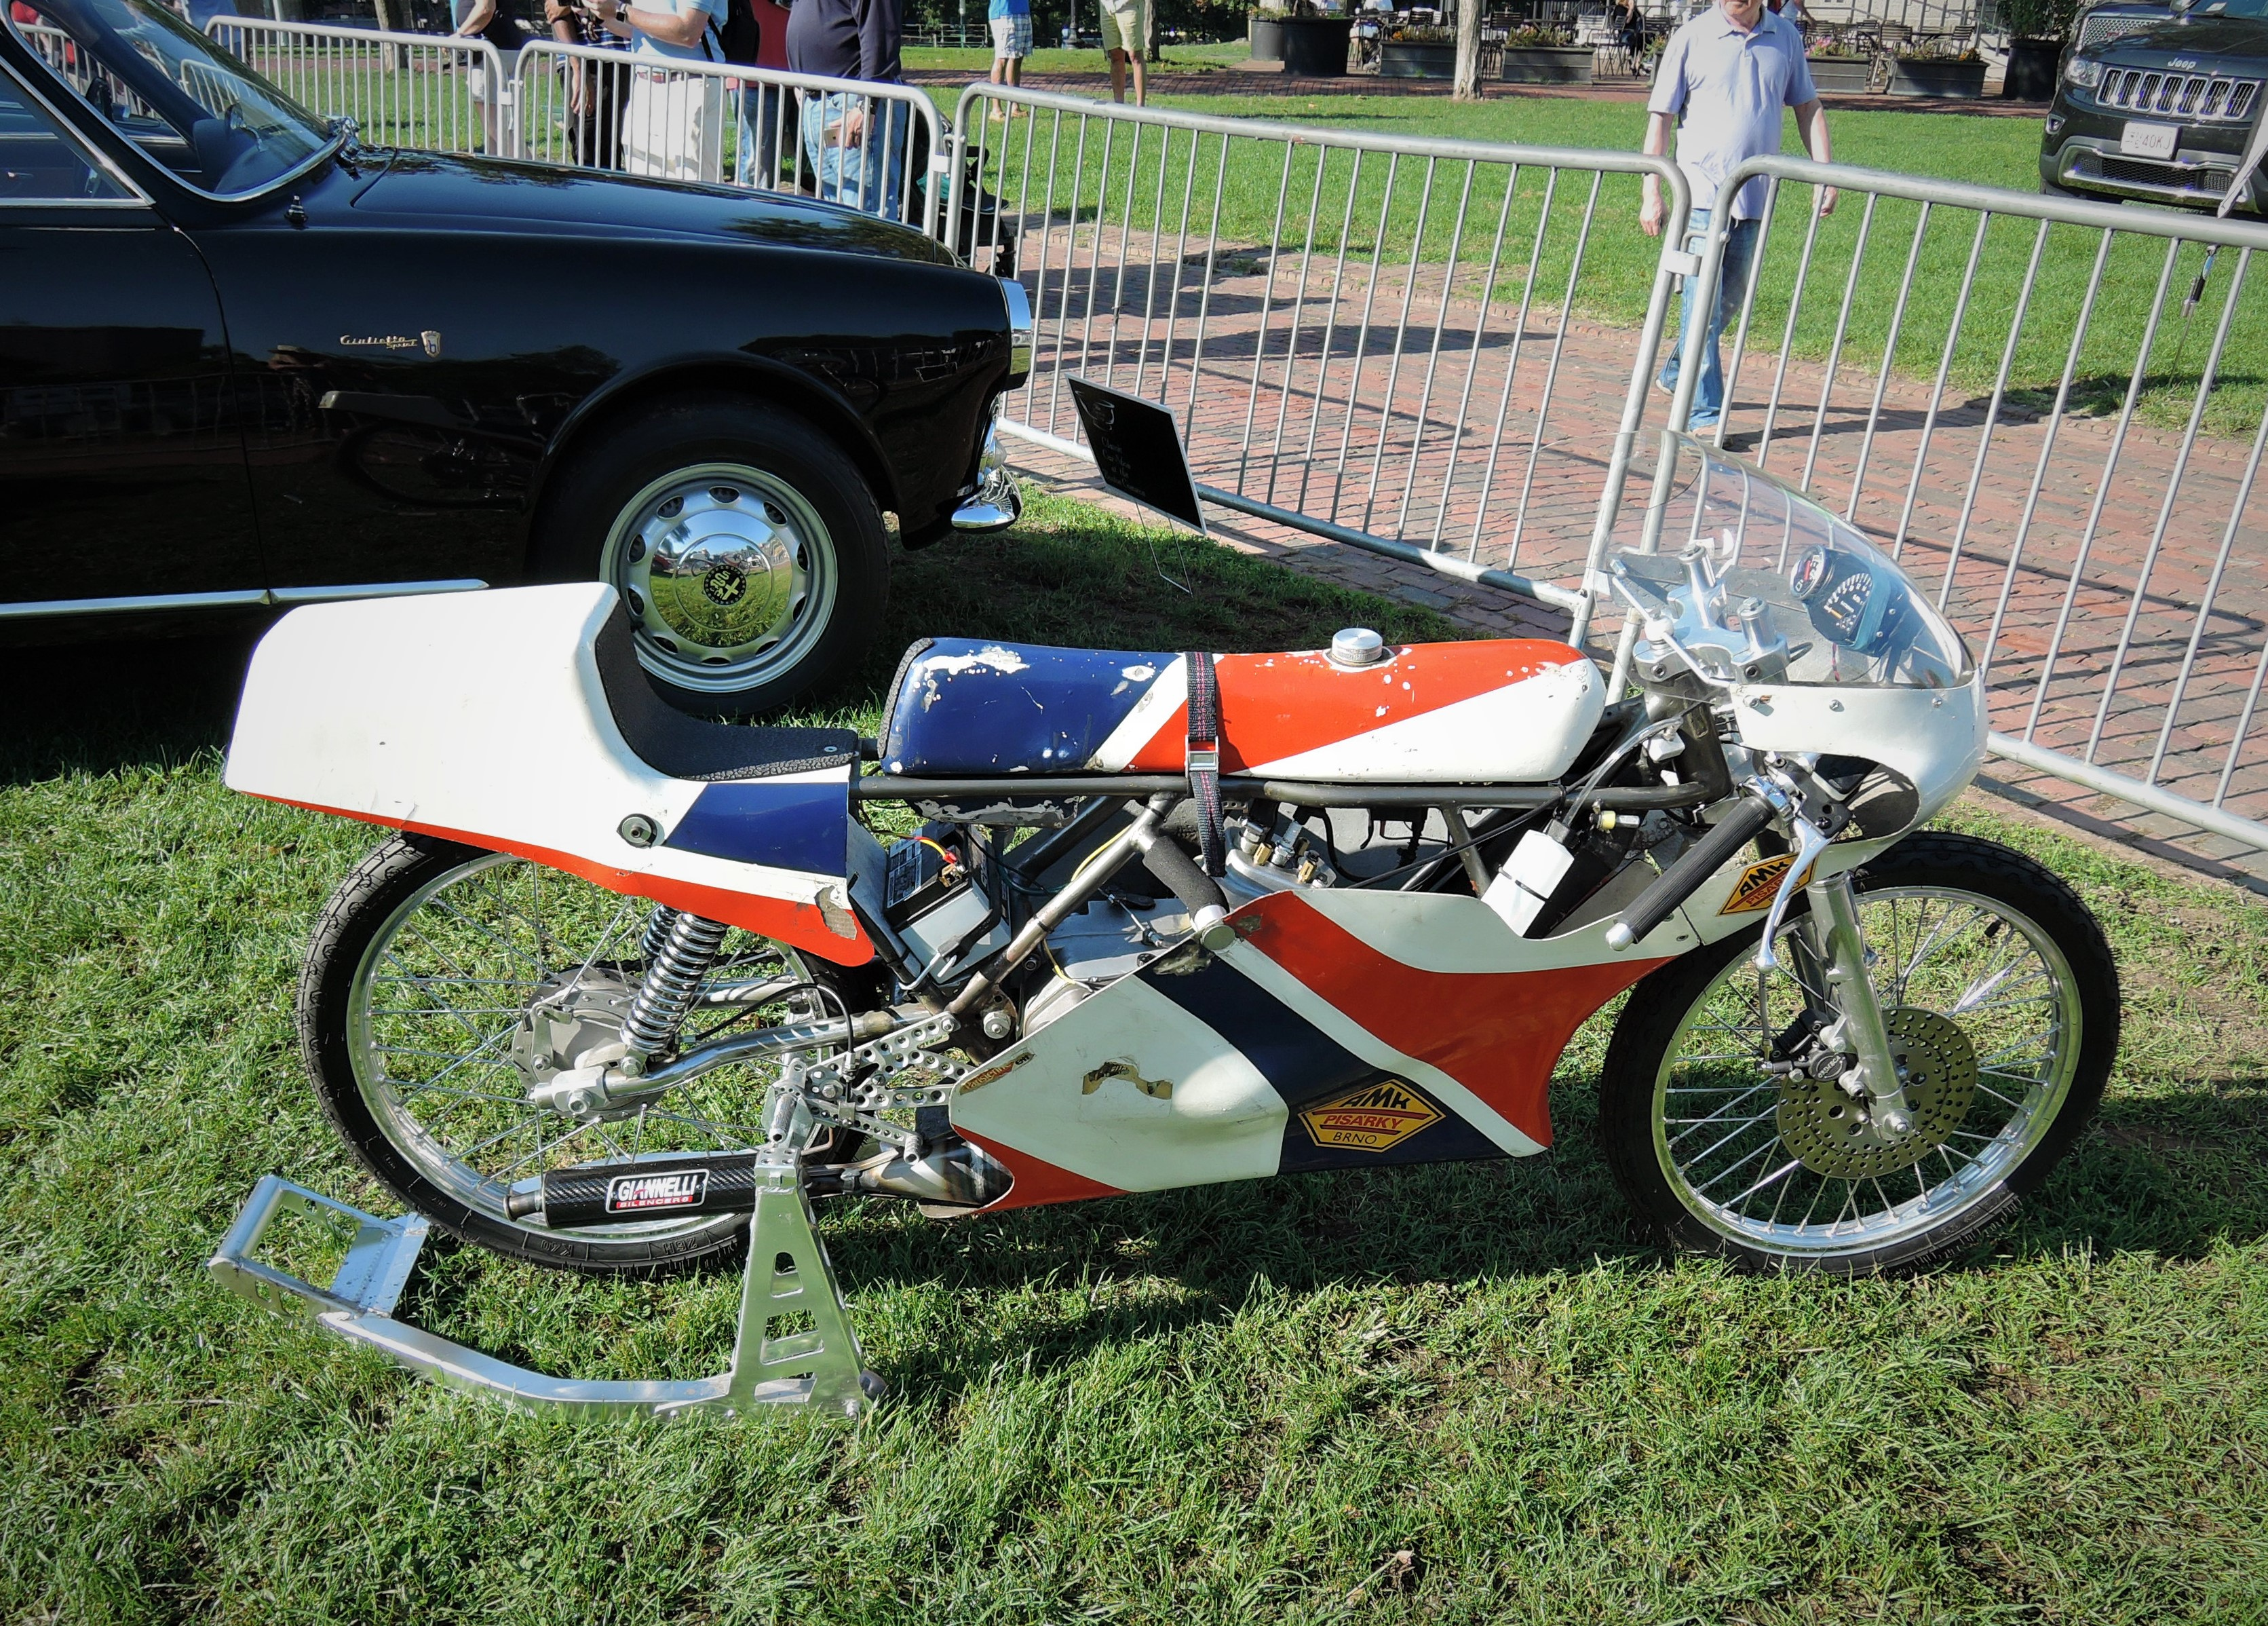 orange/white/blue 1974 CZ - Minarelli 50 GP motorcycle - The Boston Cup 2017